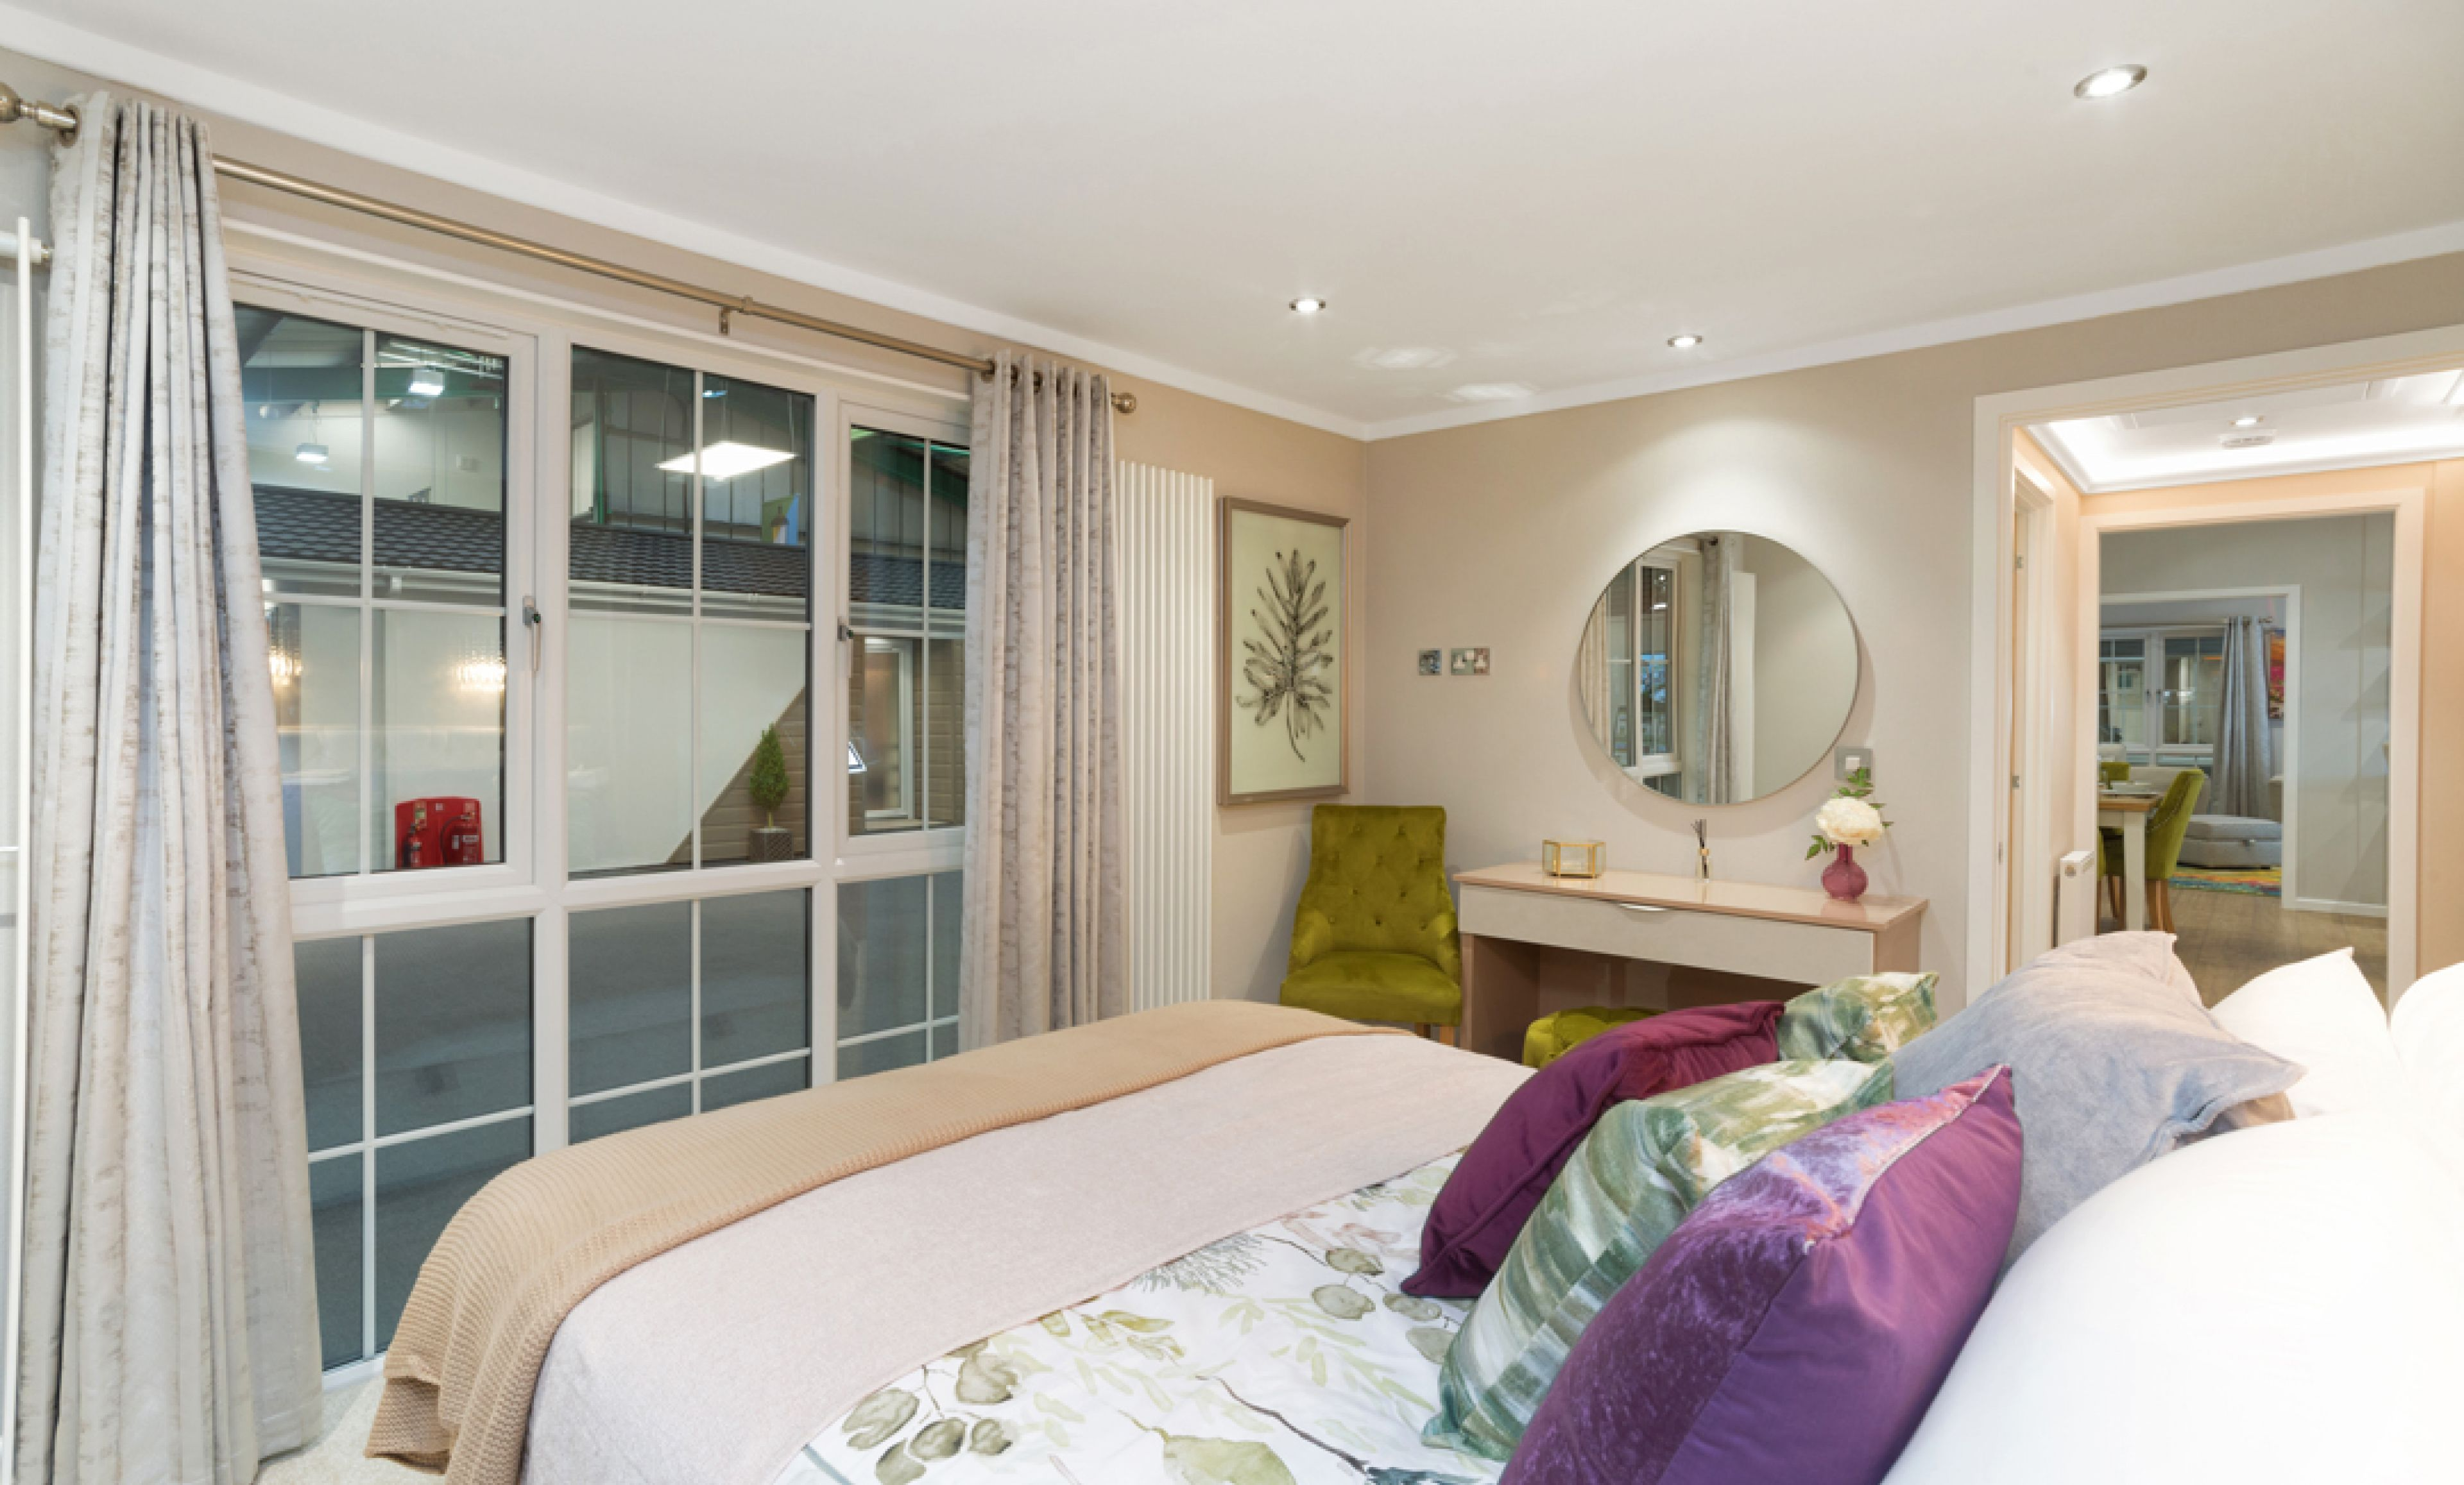 The Addington bedroom